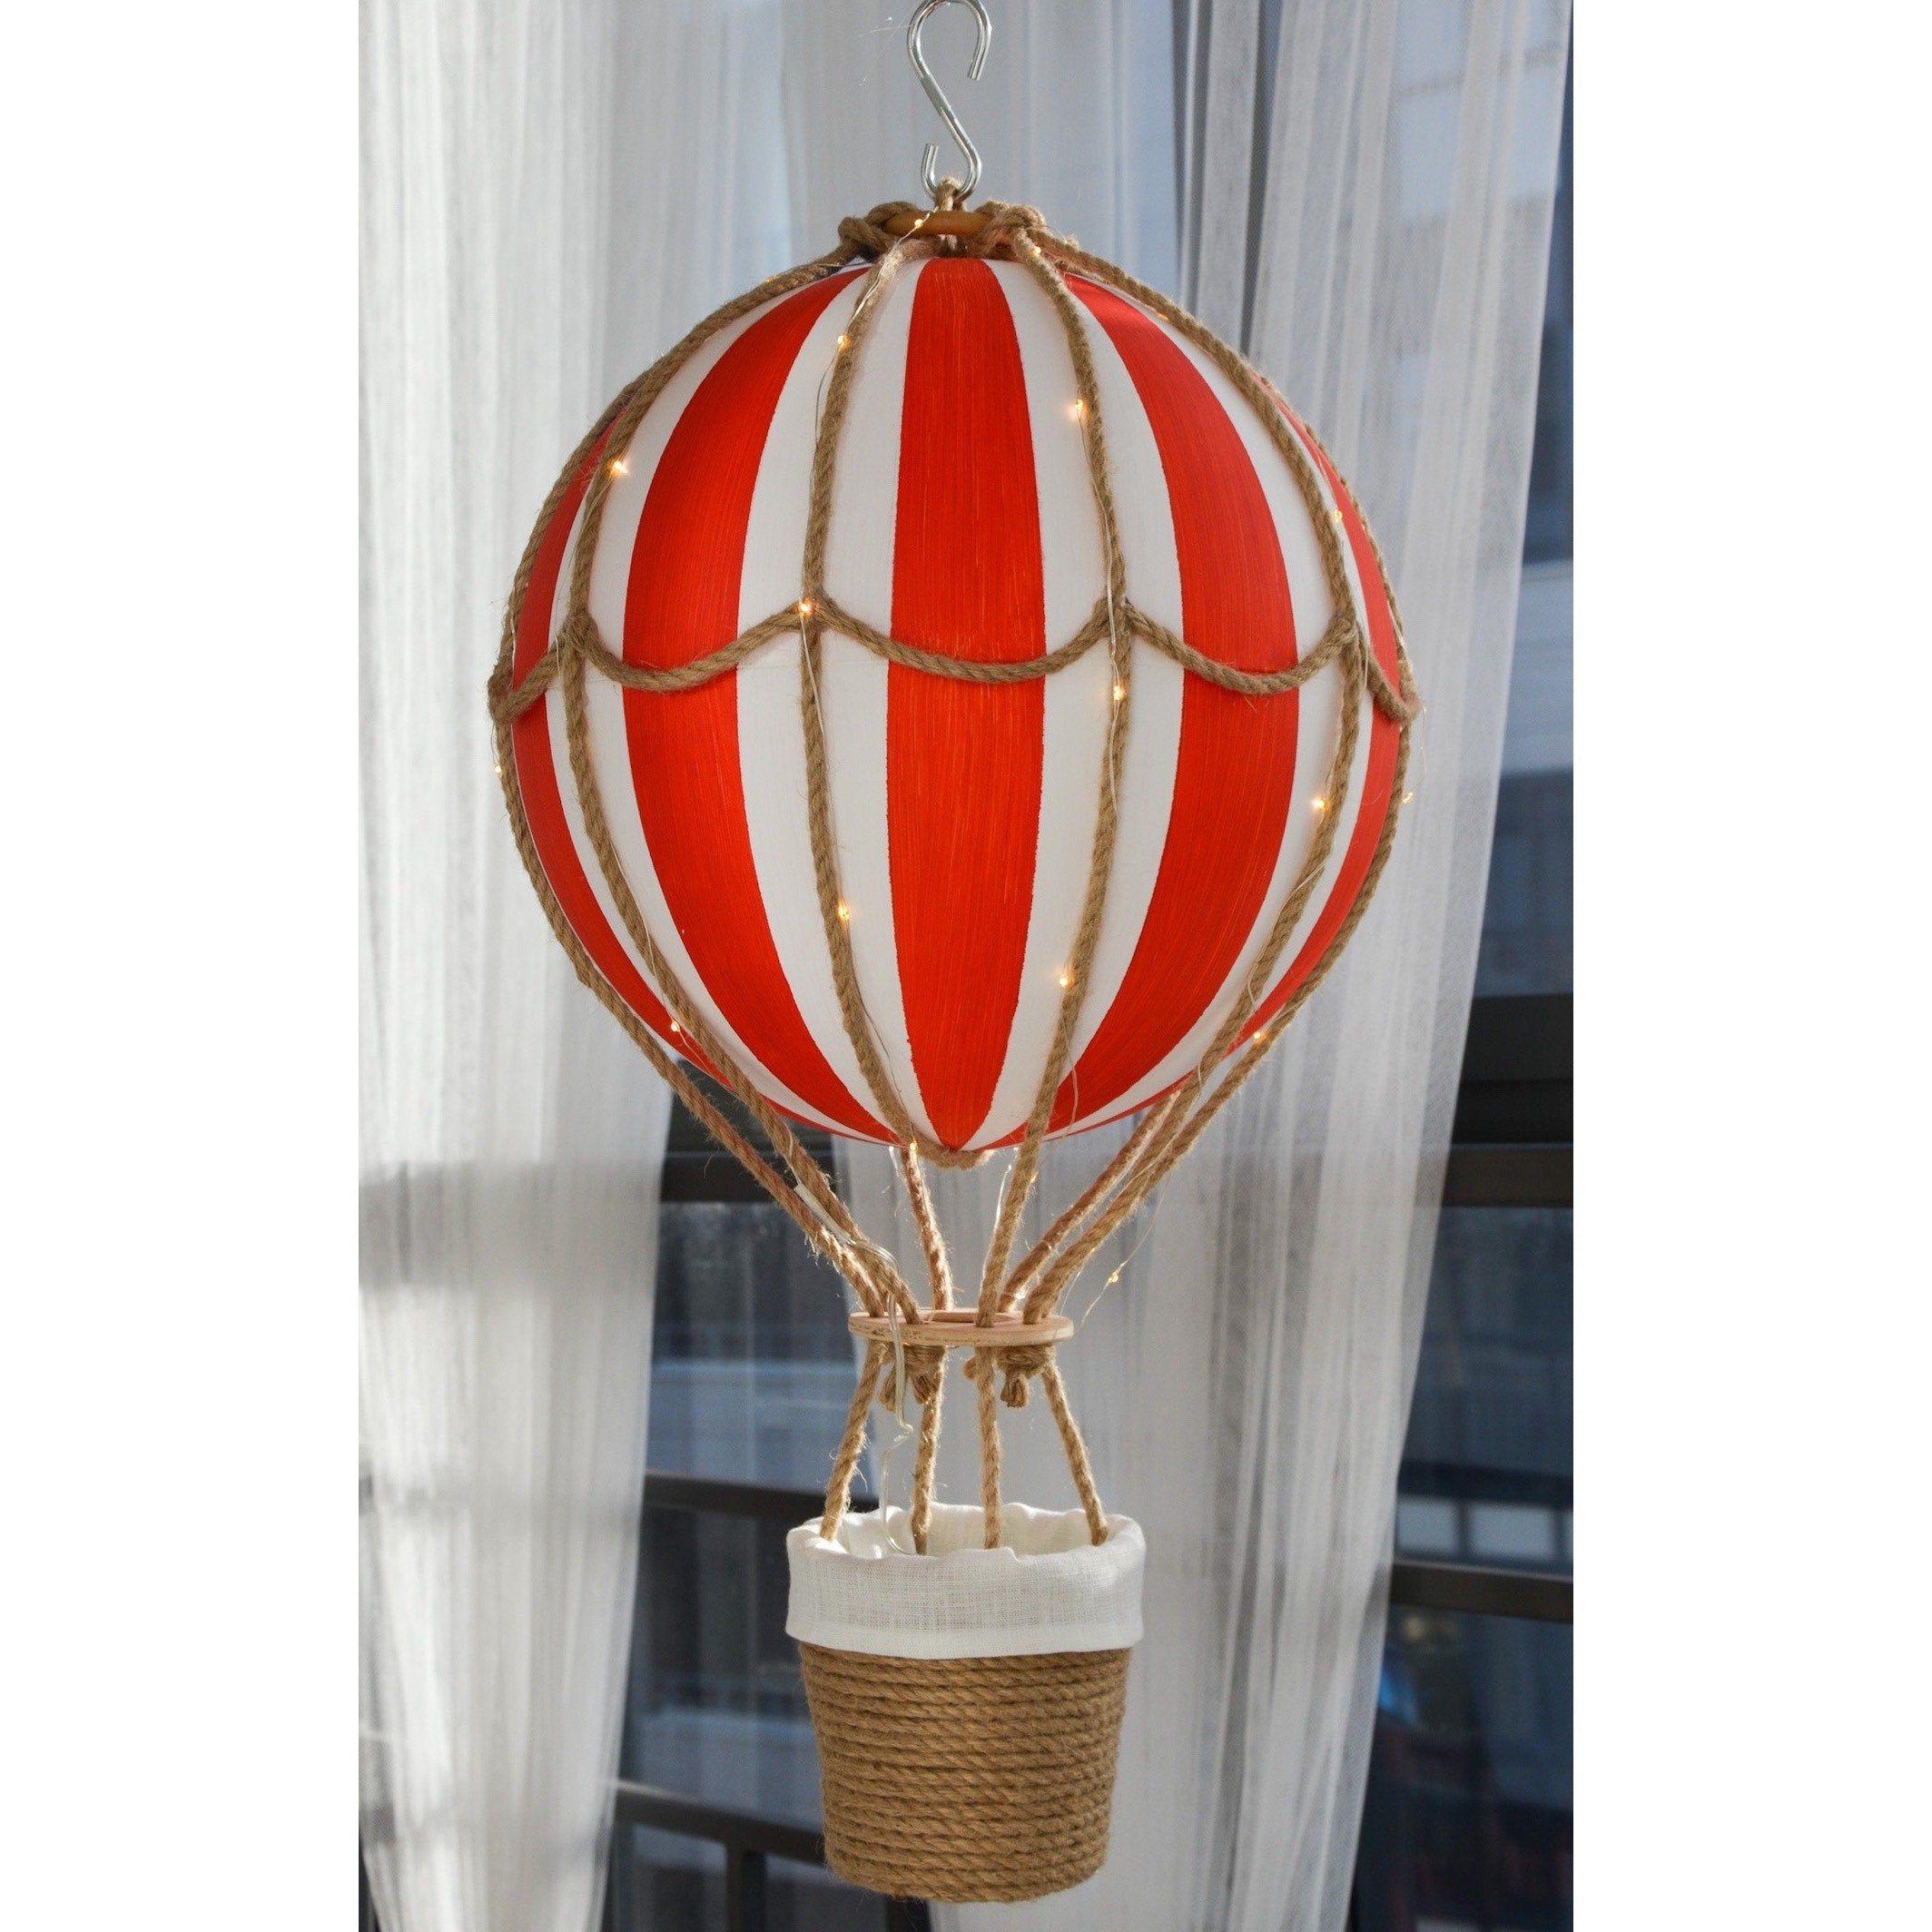 Hot Air Balloon Big Night Light Travel Nursery Decor